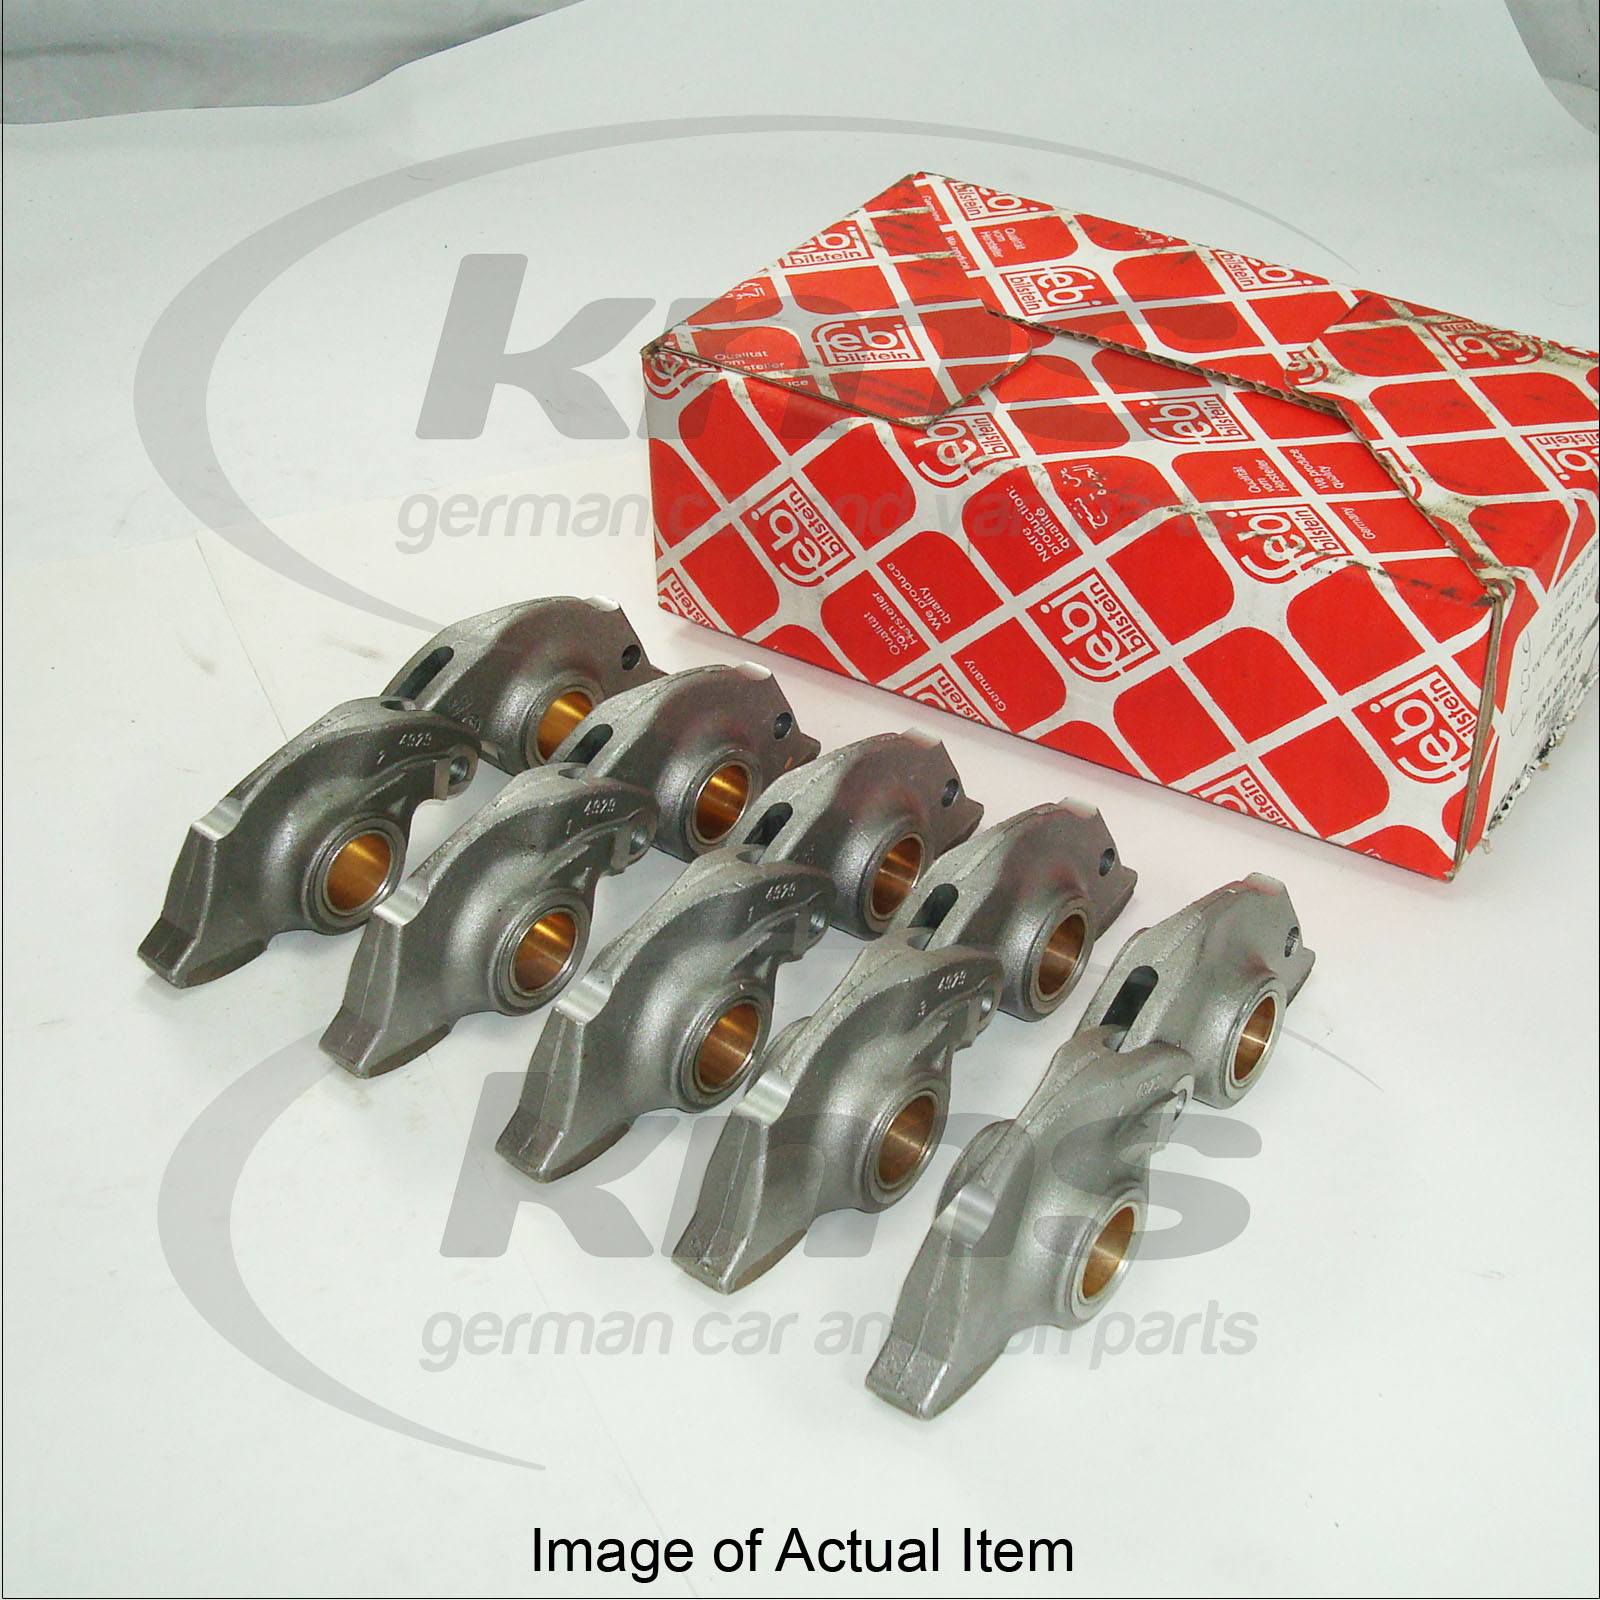 CAM FOLLOWER 3/5/7 Series 1.6,1.6i,1.8i,2.5i-3.5i M10,M30 75-94 HYD BMW 3 SERIES